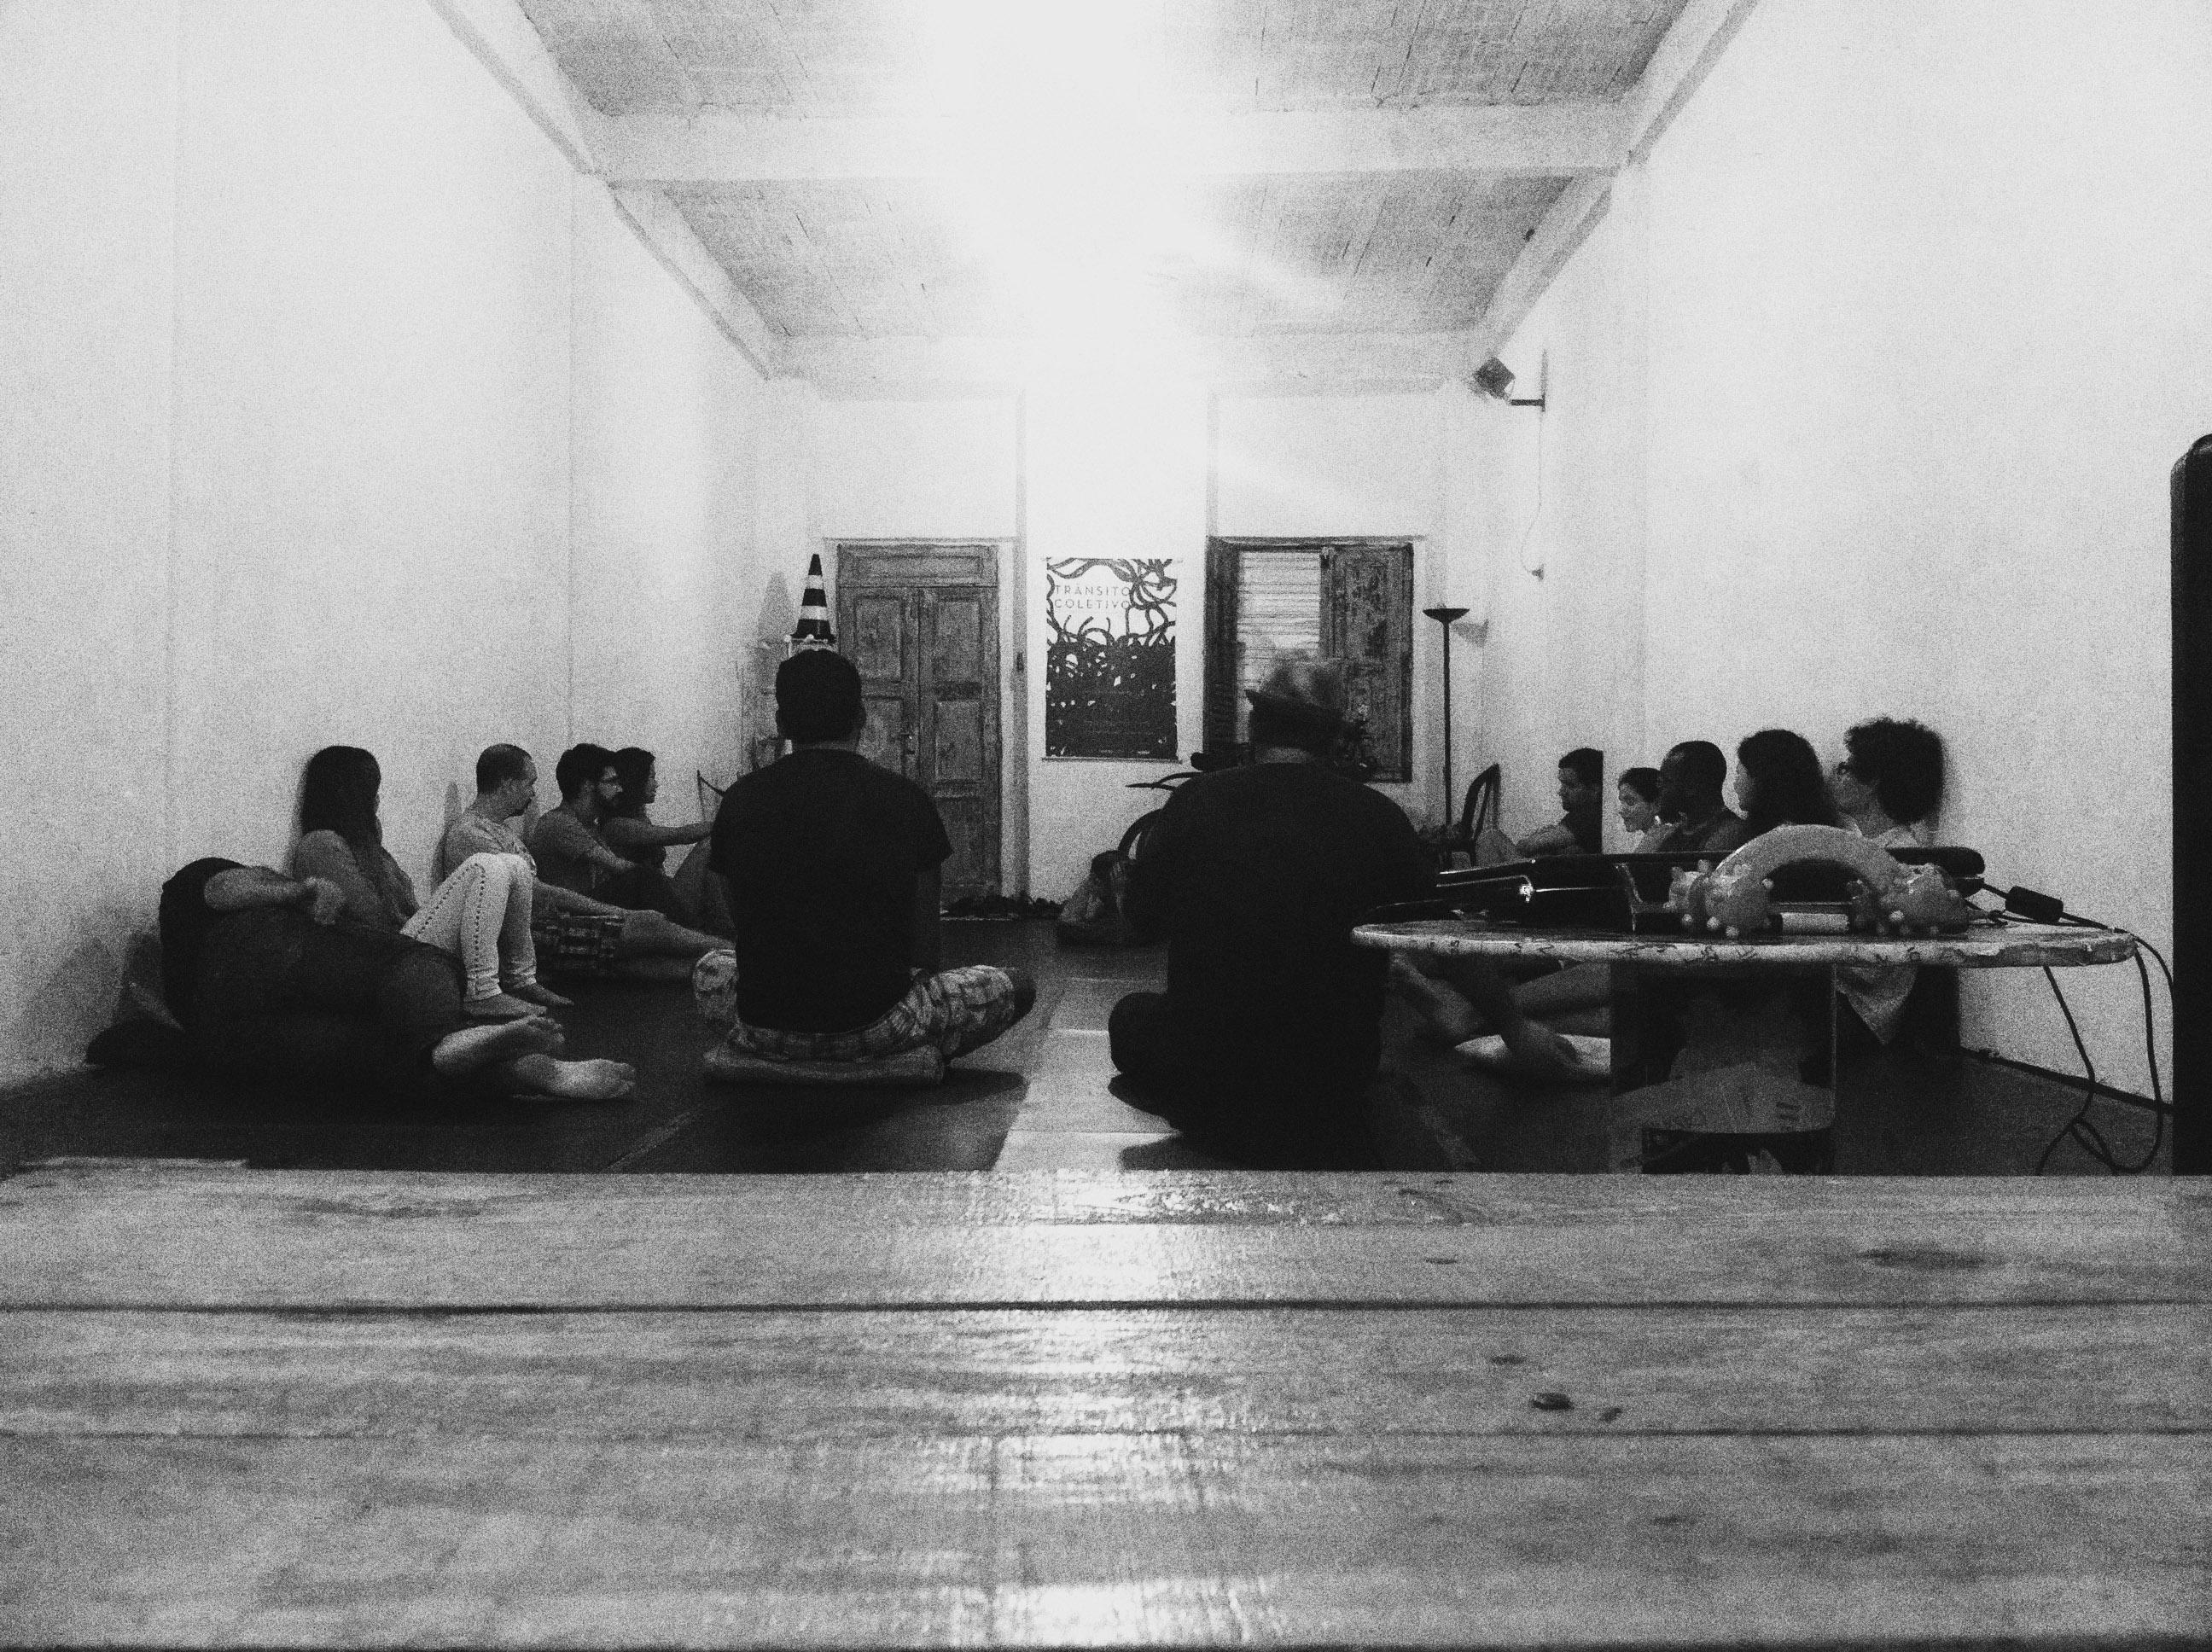 prisões, recife, 23ago14, coletivo lugar comum. foto claudia regina